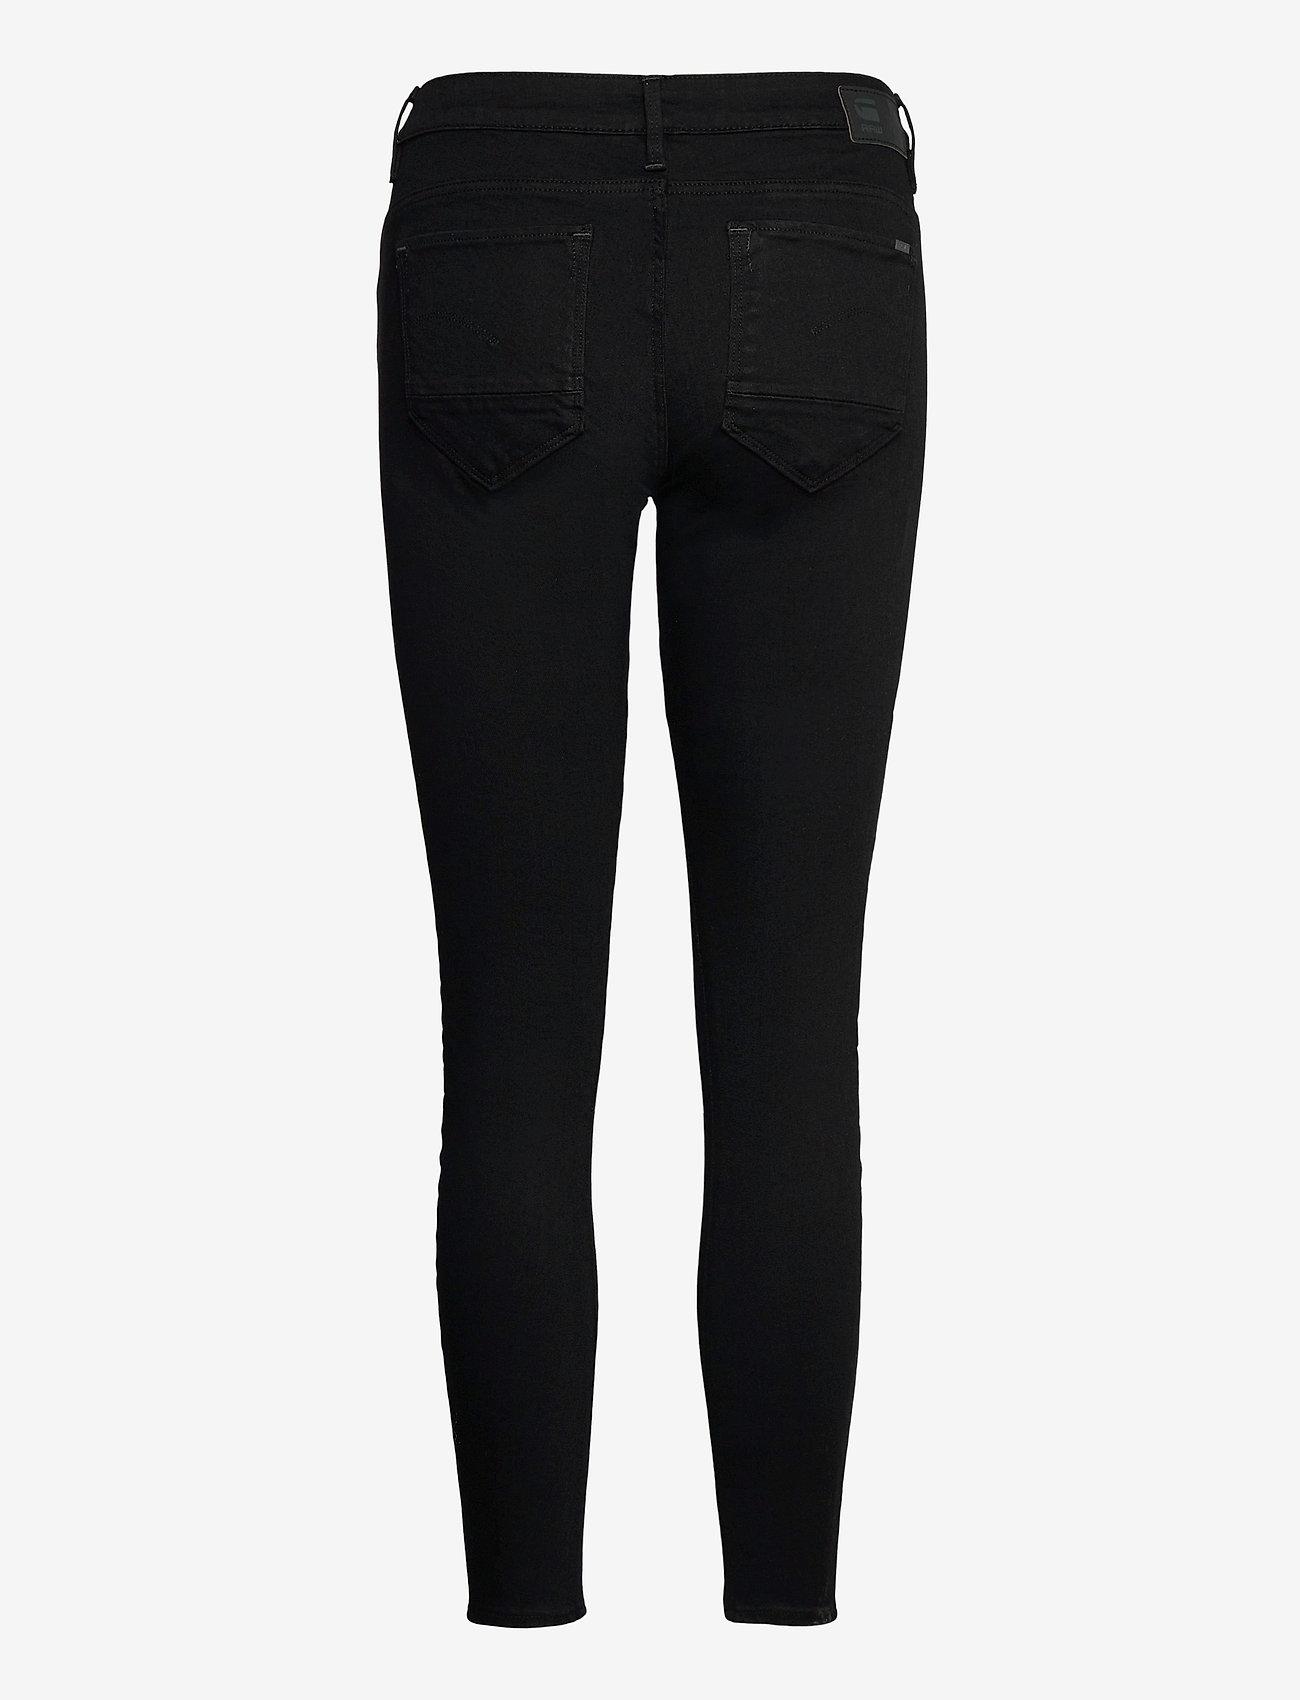 G-star RAW - Arc 3D Mid Skinny Wmn - skinny jeans - pitch black - 1